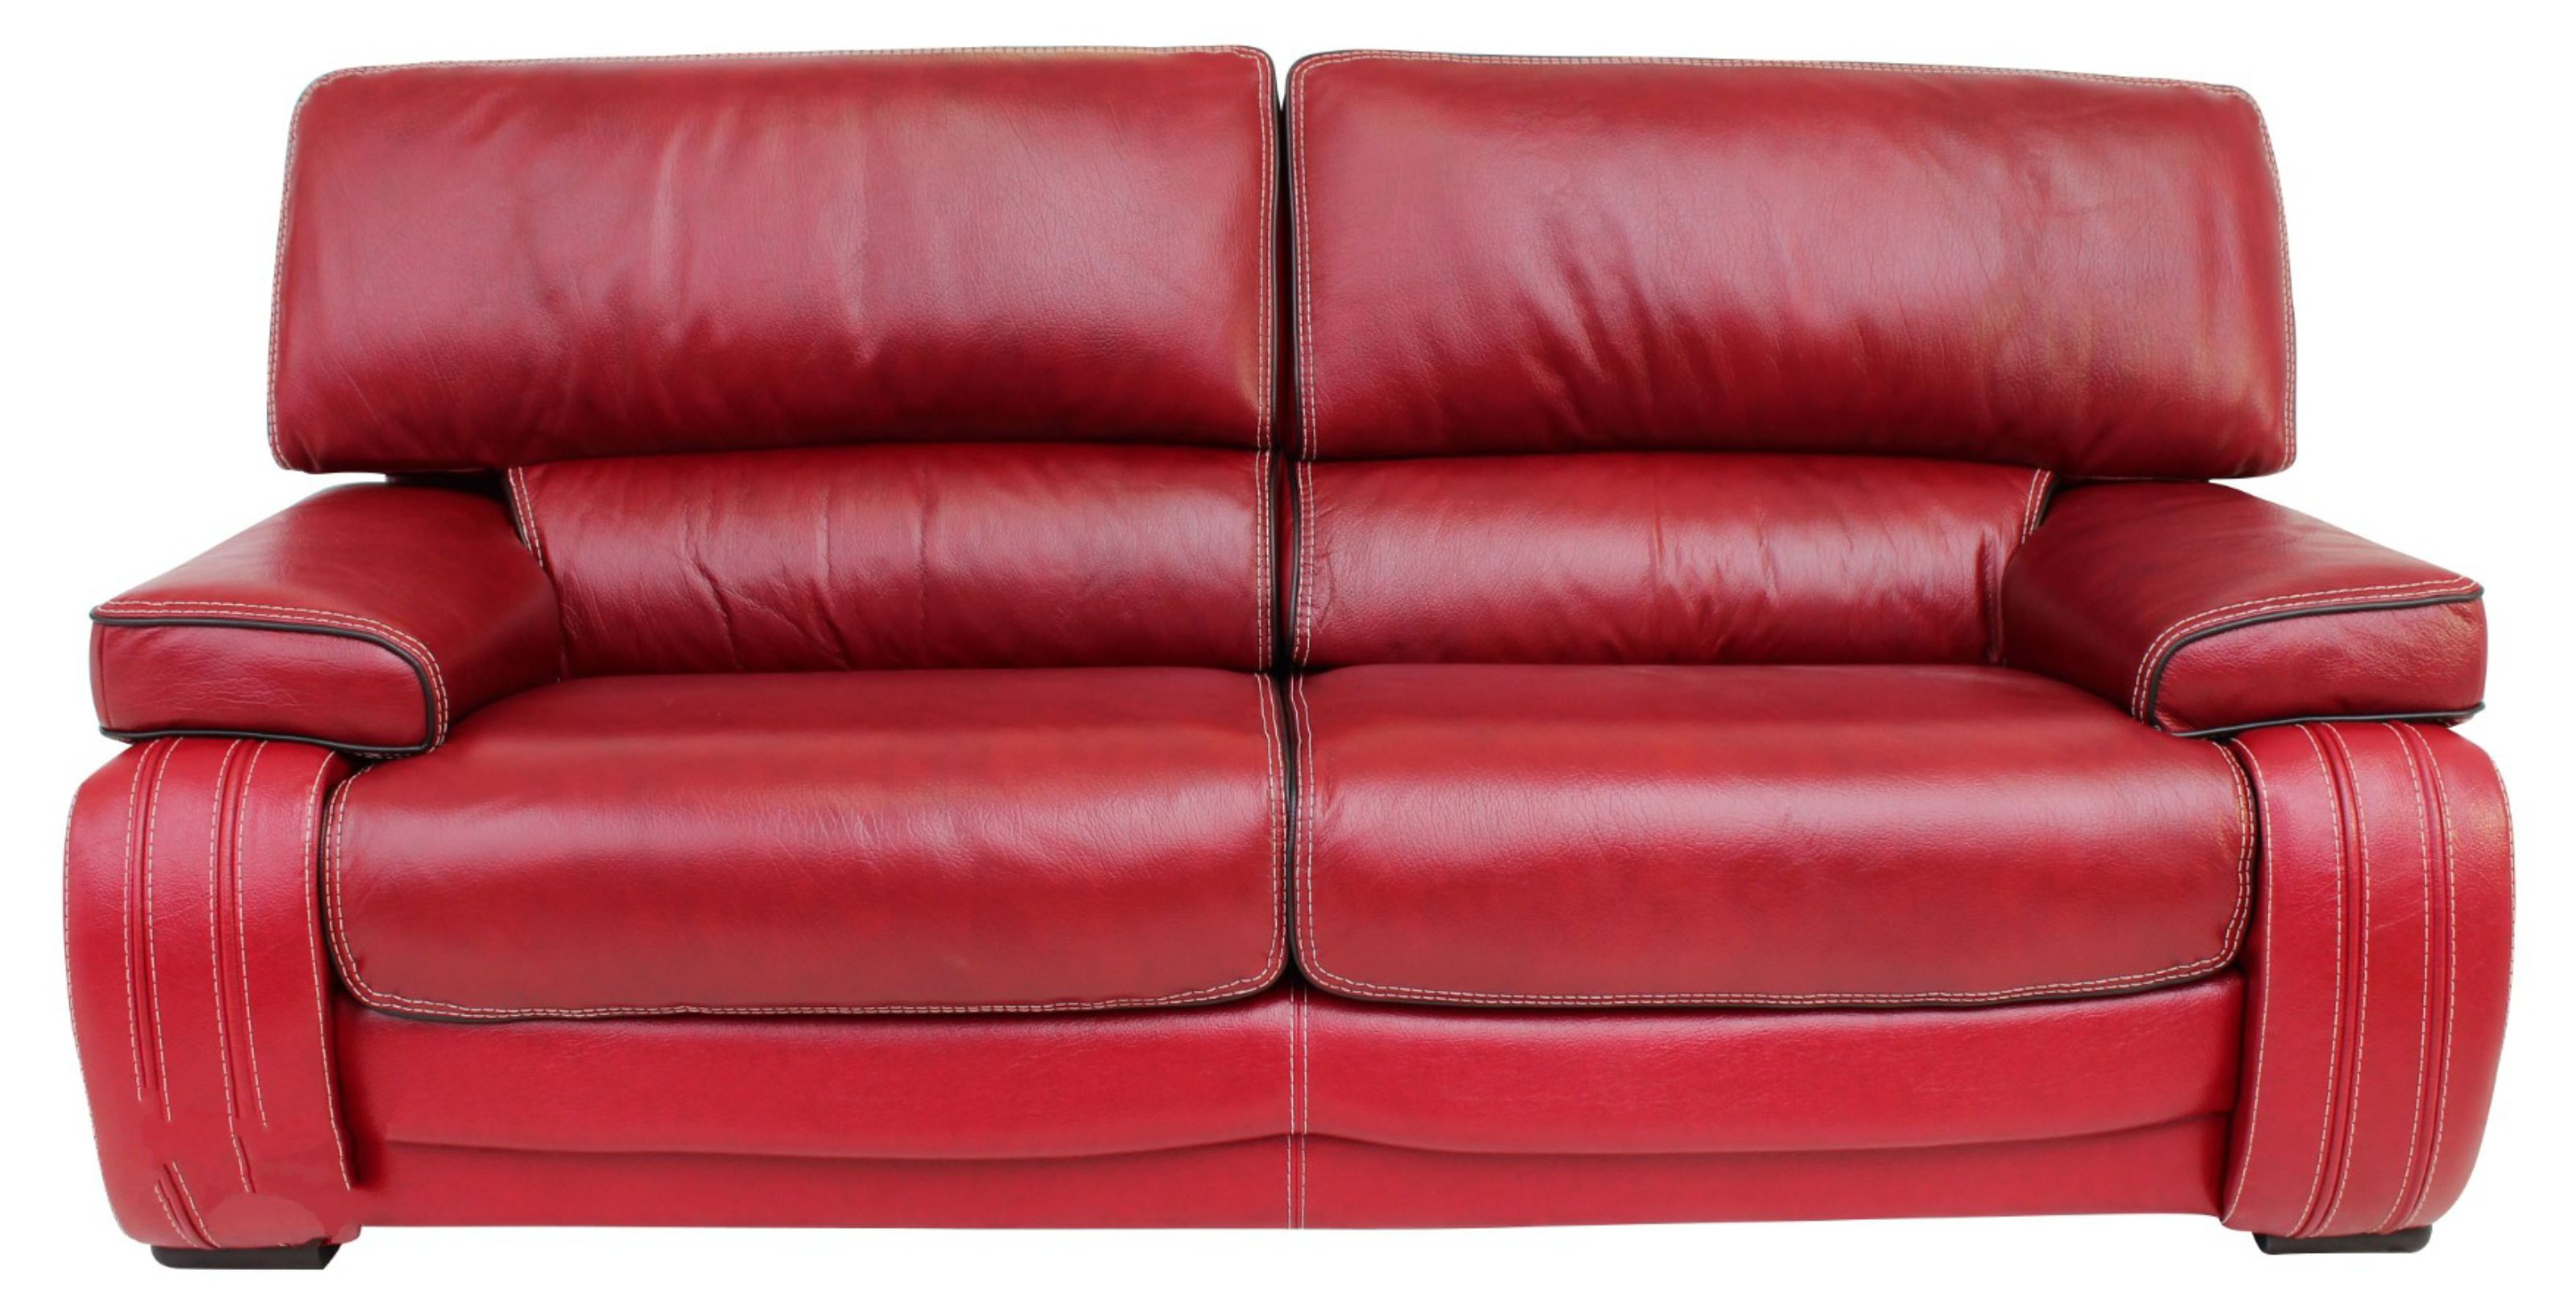 kentucky 3 seater genuine italian red leather sofa settee offer rh designersofas4u co uk red leather sofas and chairs red leather sofas for sale